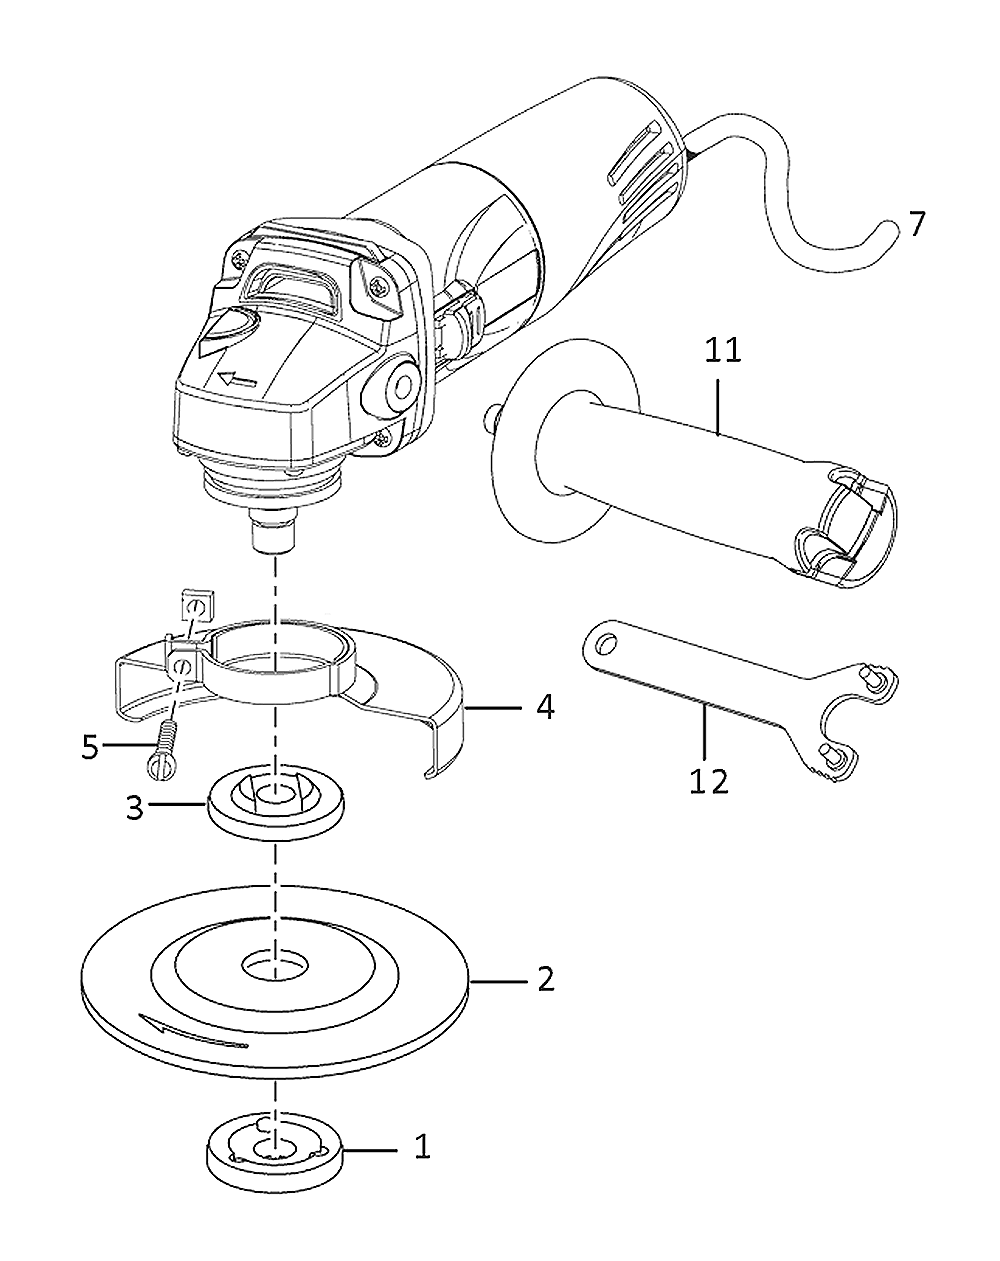 Buy Ryobi Ag401 Replacement Tool Parts Ryobi Ag401 Other